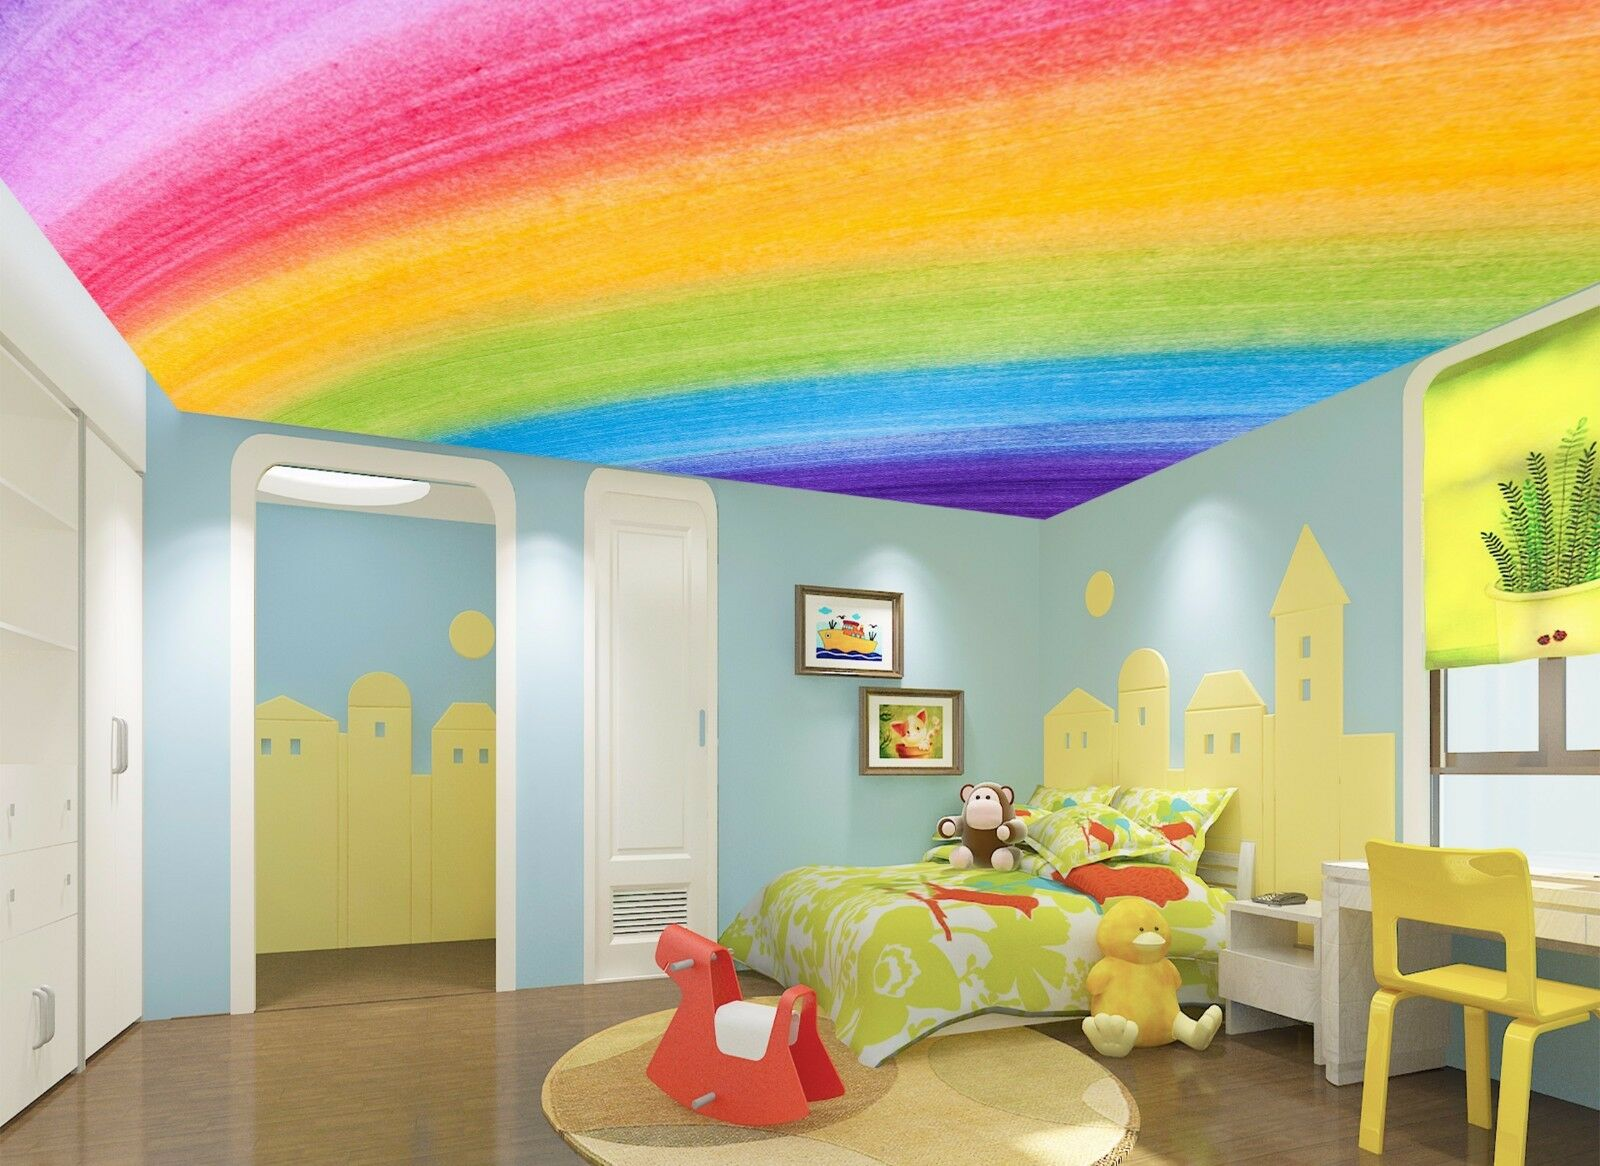 3D Rainbow 753 Ceiling WallPaper Murals Wall Print Decal Deco AJ WALLPAPER GB